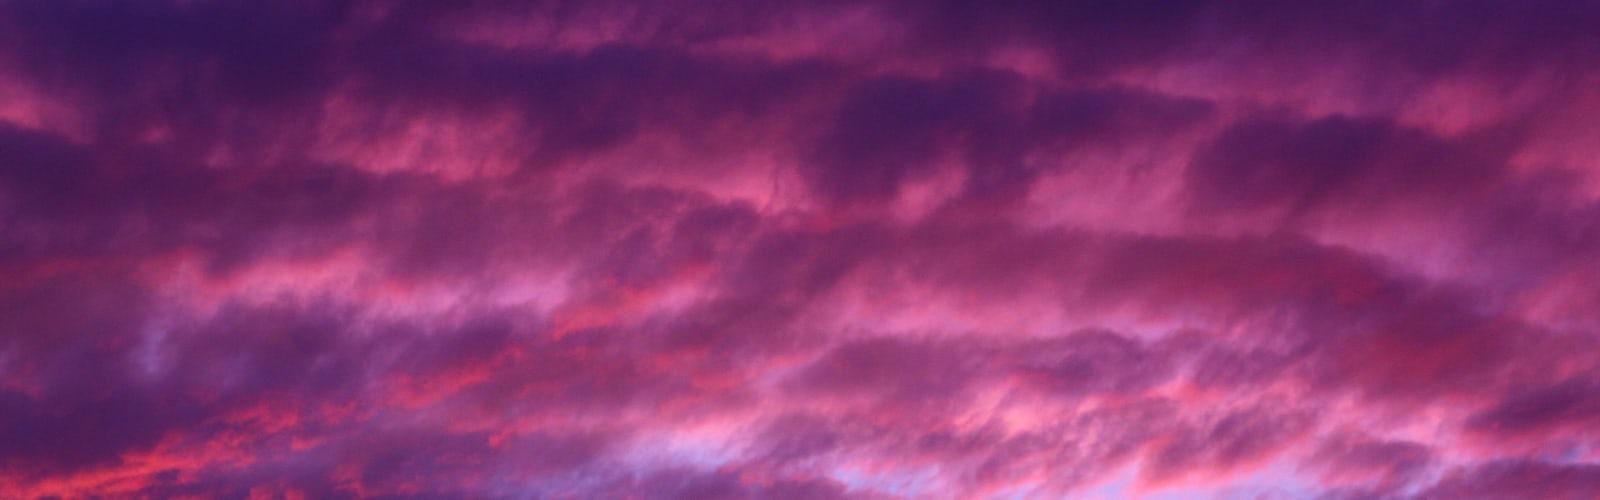 Blue Aesthetics Hd 23 Best Free Aesthetic Pink Blue